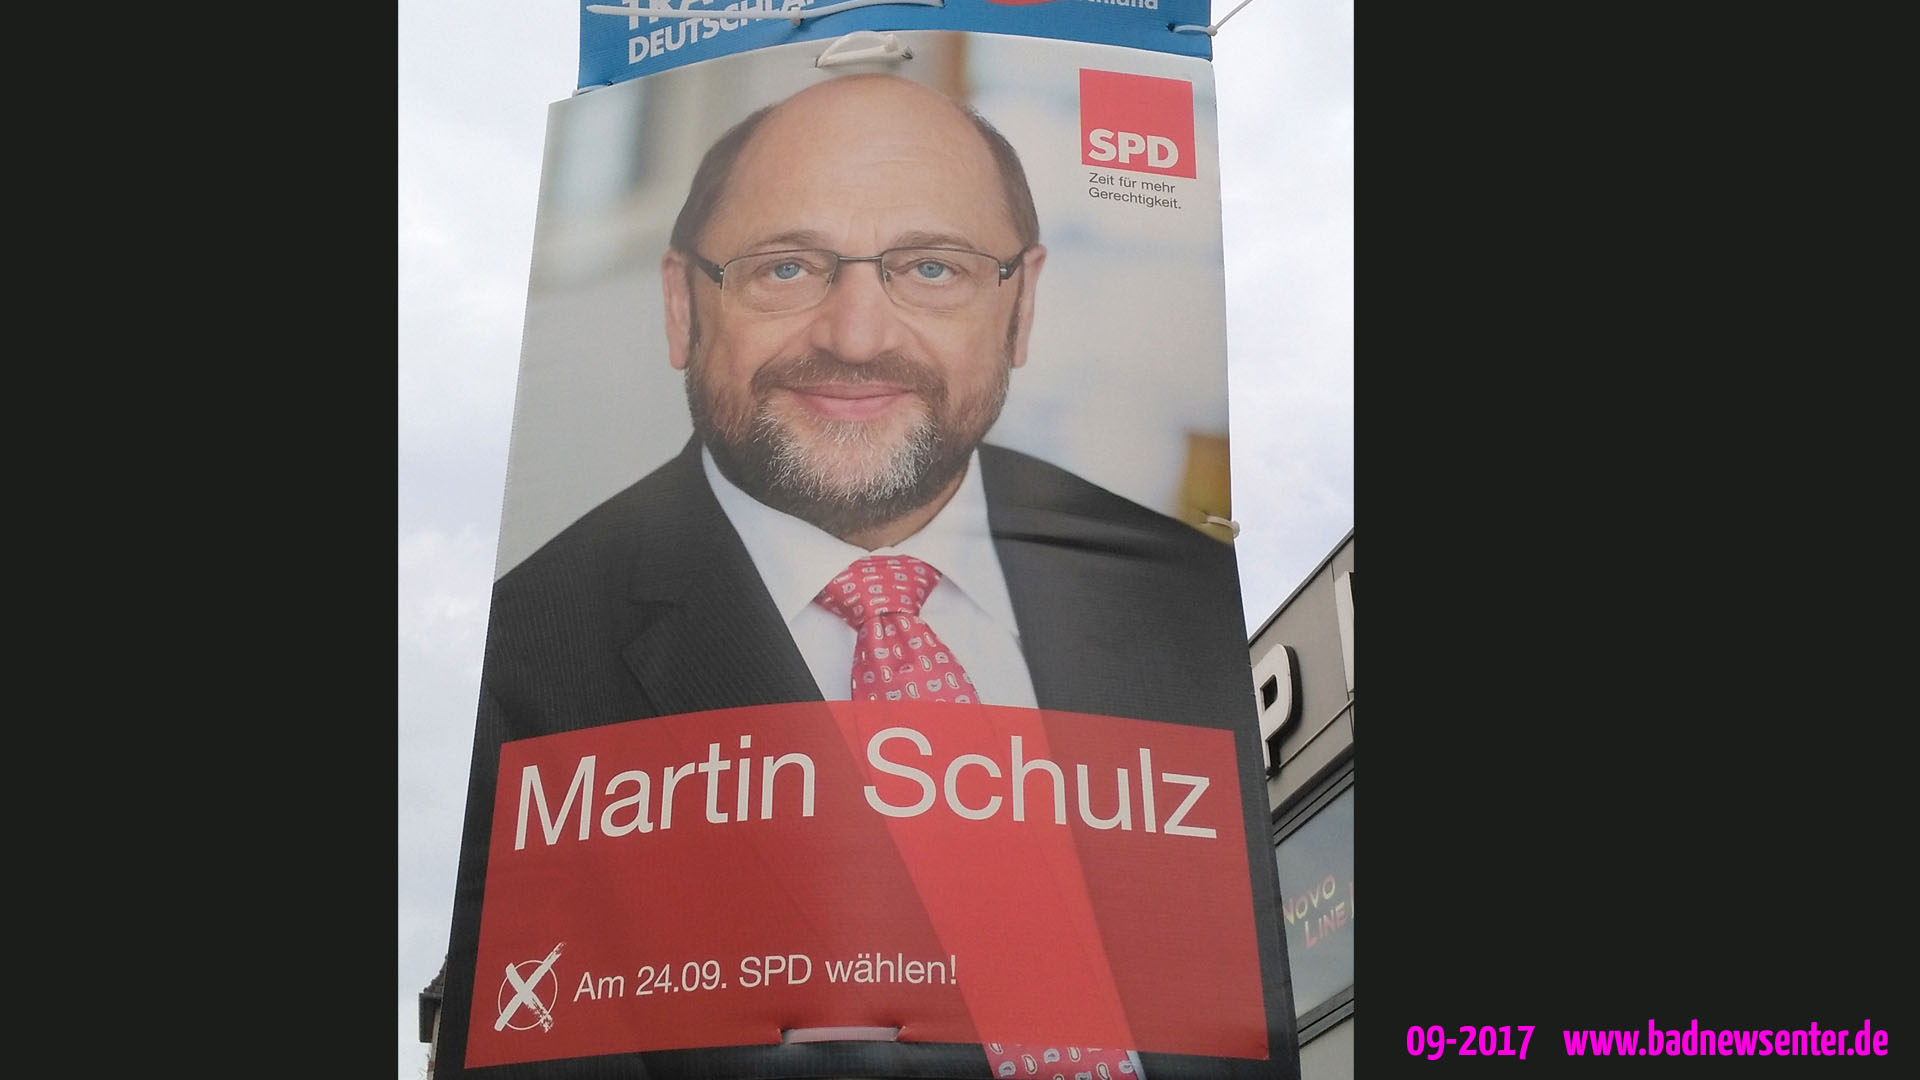 BNE-09-2017-Wahlkampf-001